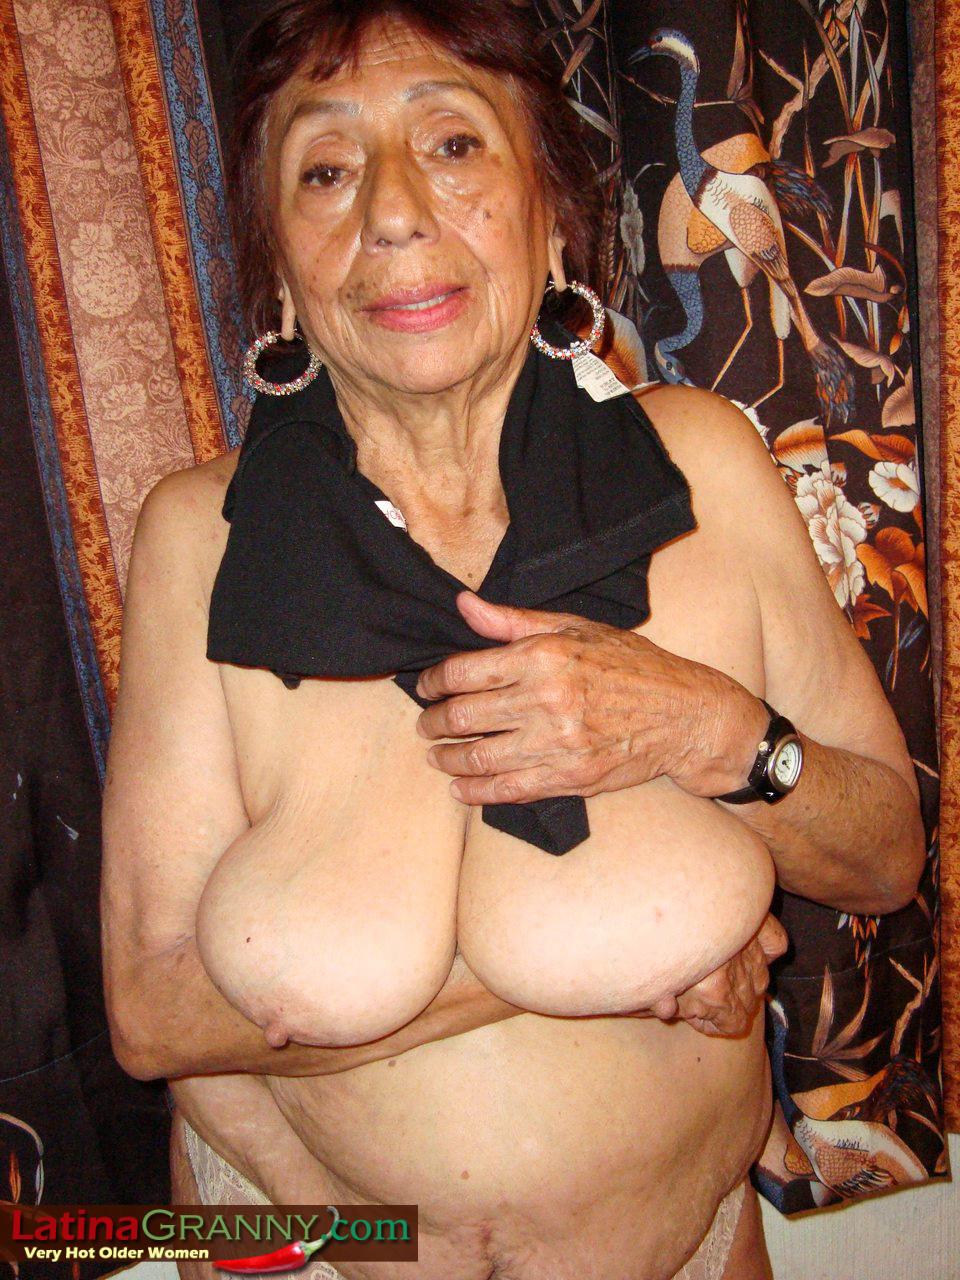 Granny latina tits